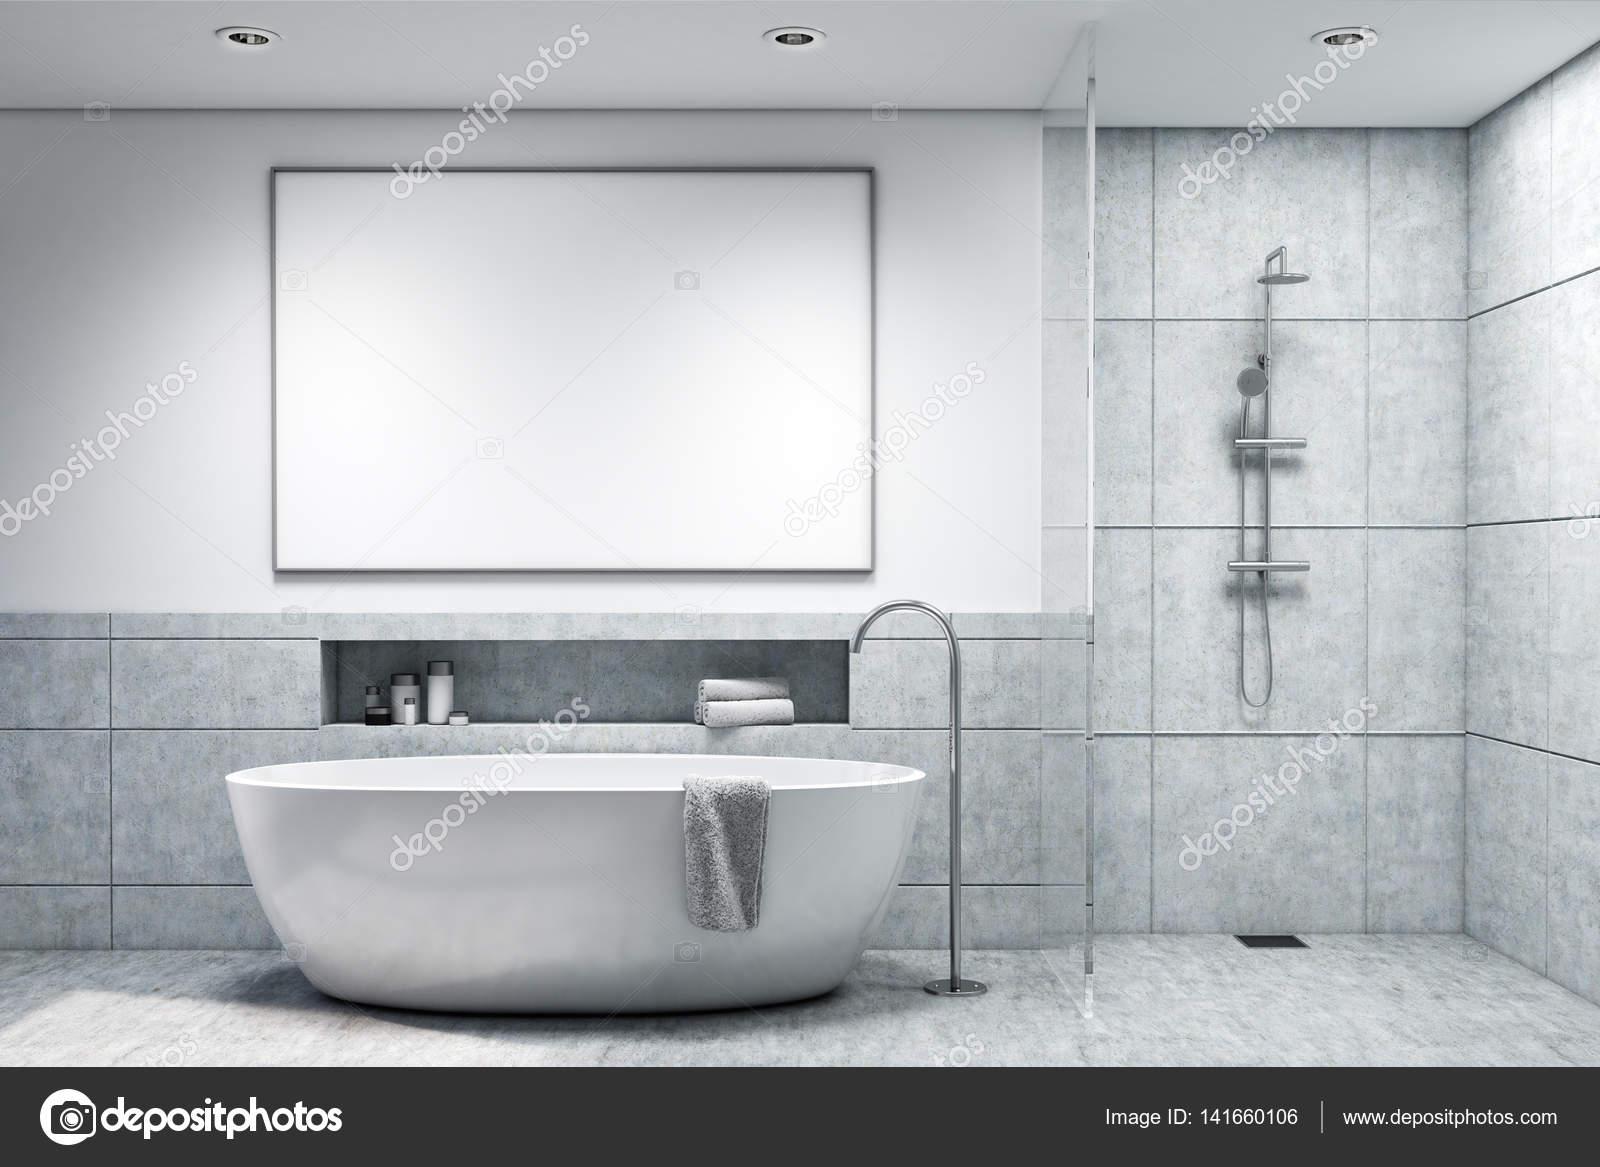 Bagno con piastrelle ligth grigio tonica u2014 foto stock